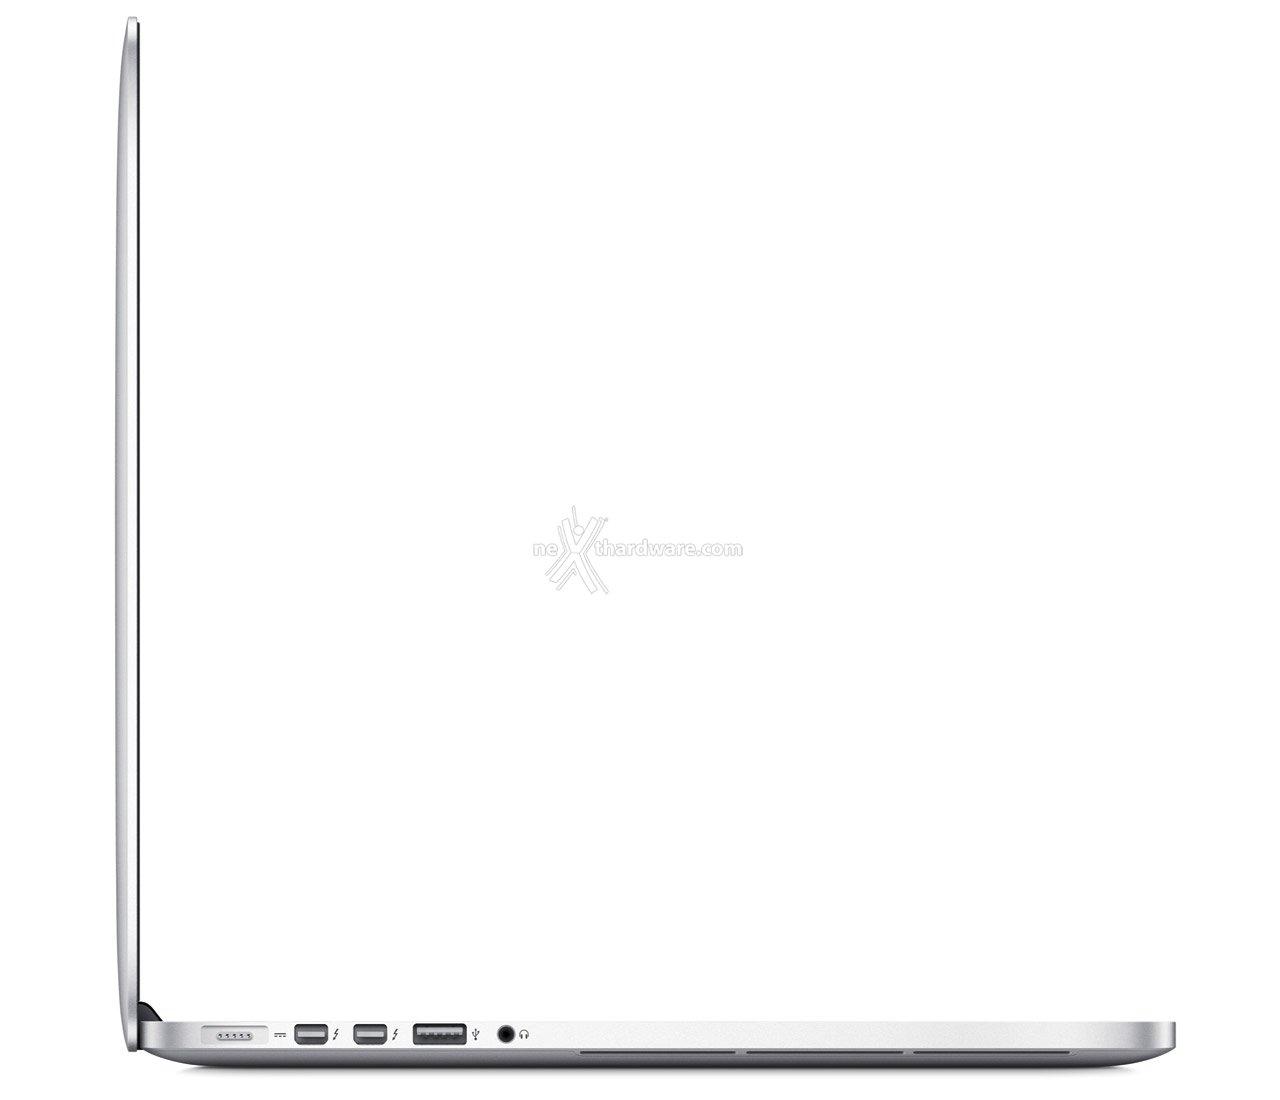 Apple MacBook Pro, Retina Display a 2880x1800pixel